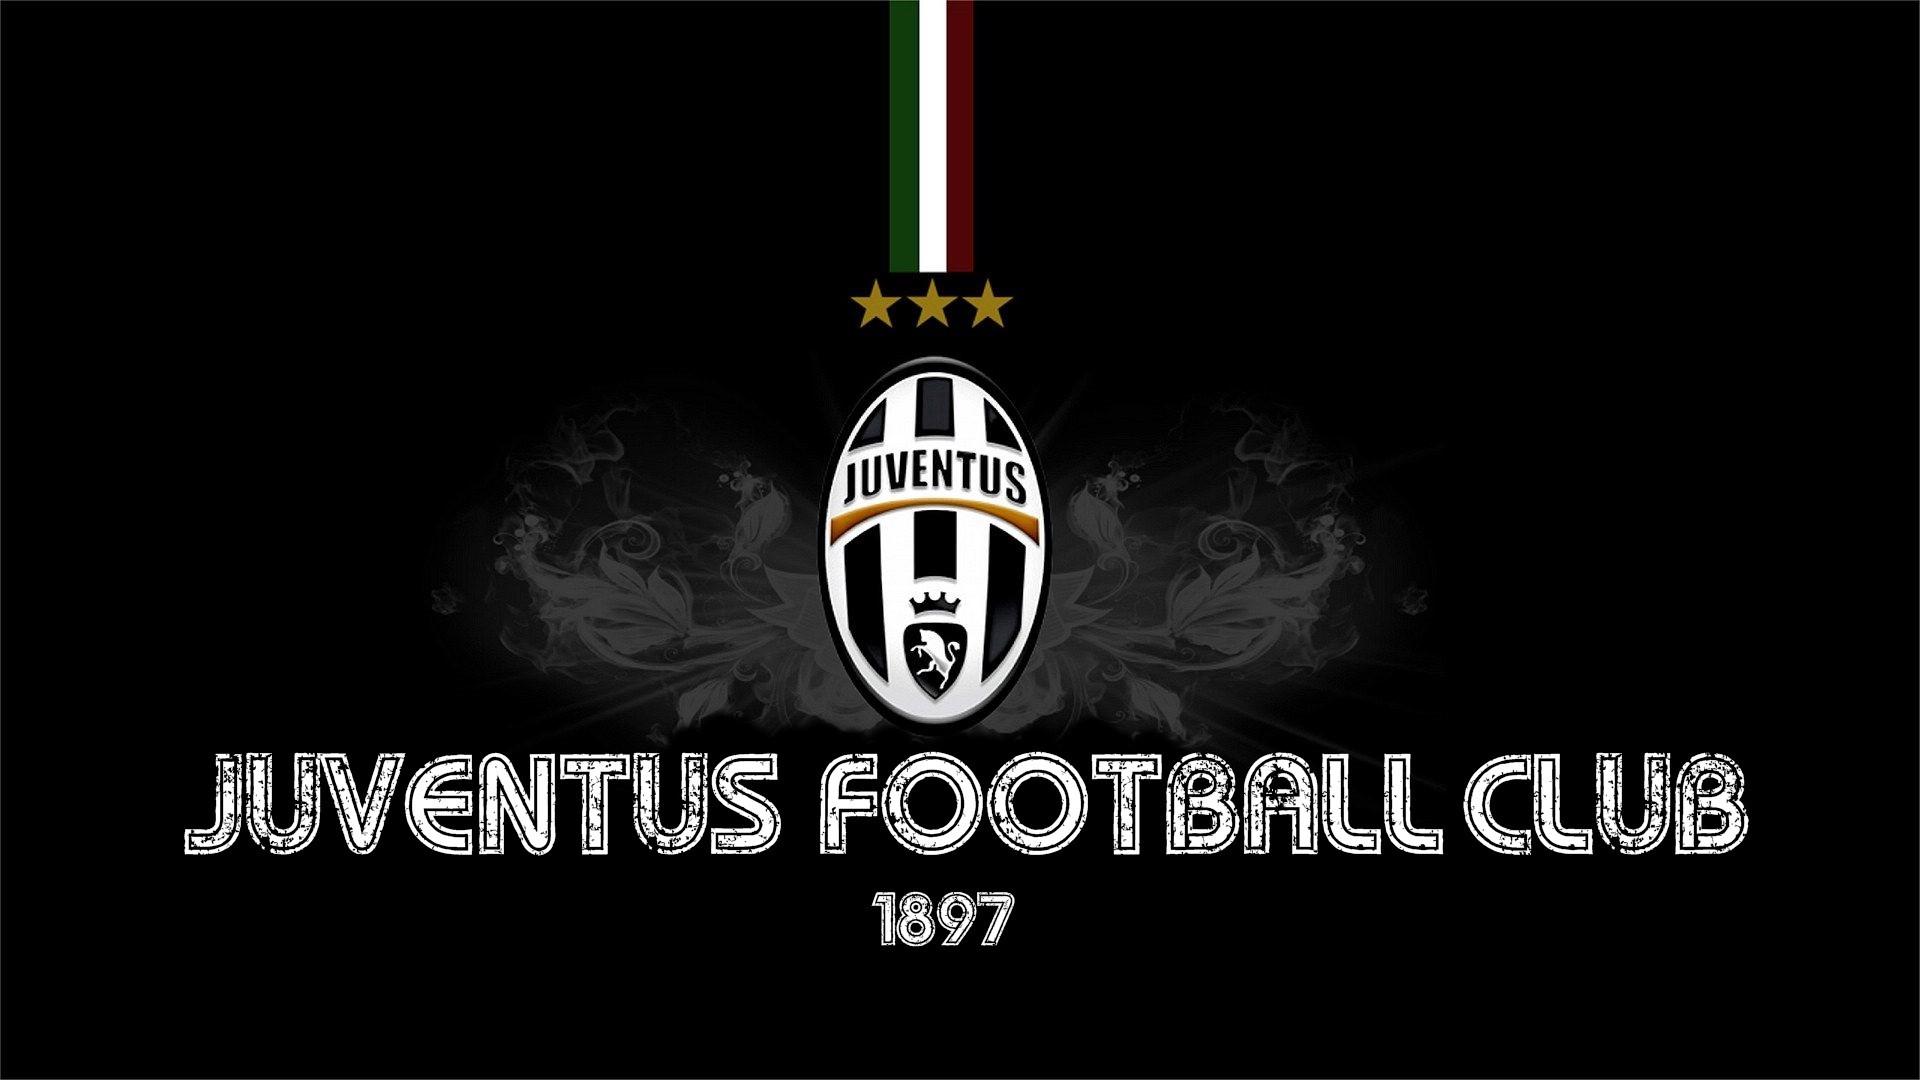 Most Inspiring Wallpaper Logo Juventus - sports-Italy-text-logo-soccer-clubs-soccer-brand-Juventus-advertising-1920x1080-px-font-distilled-beverage-liqueur-719744  Collection_109259.jpg